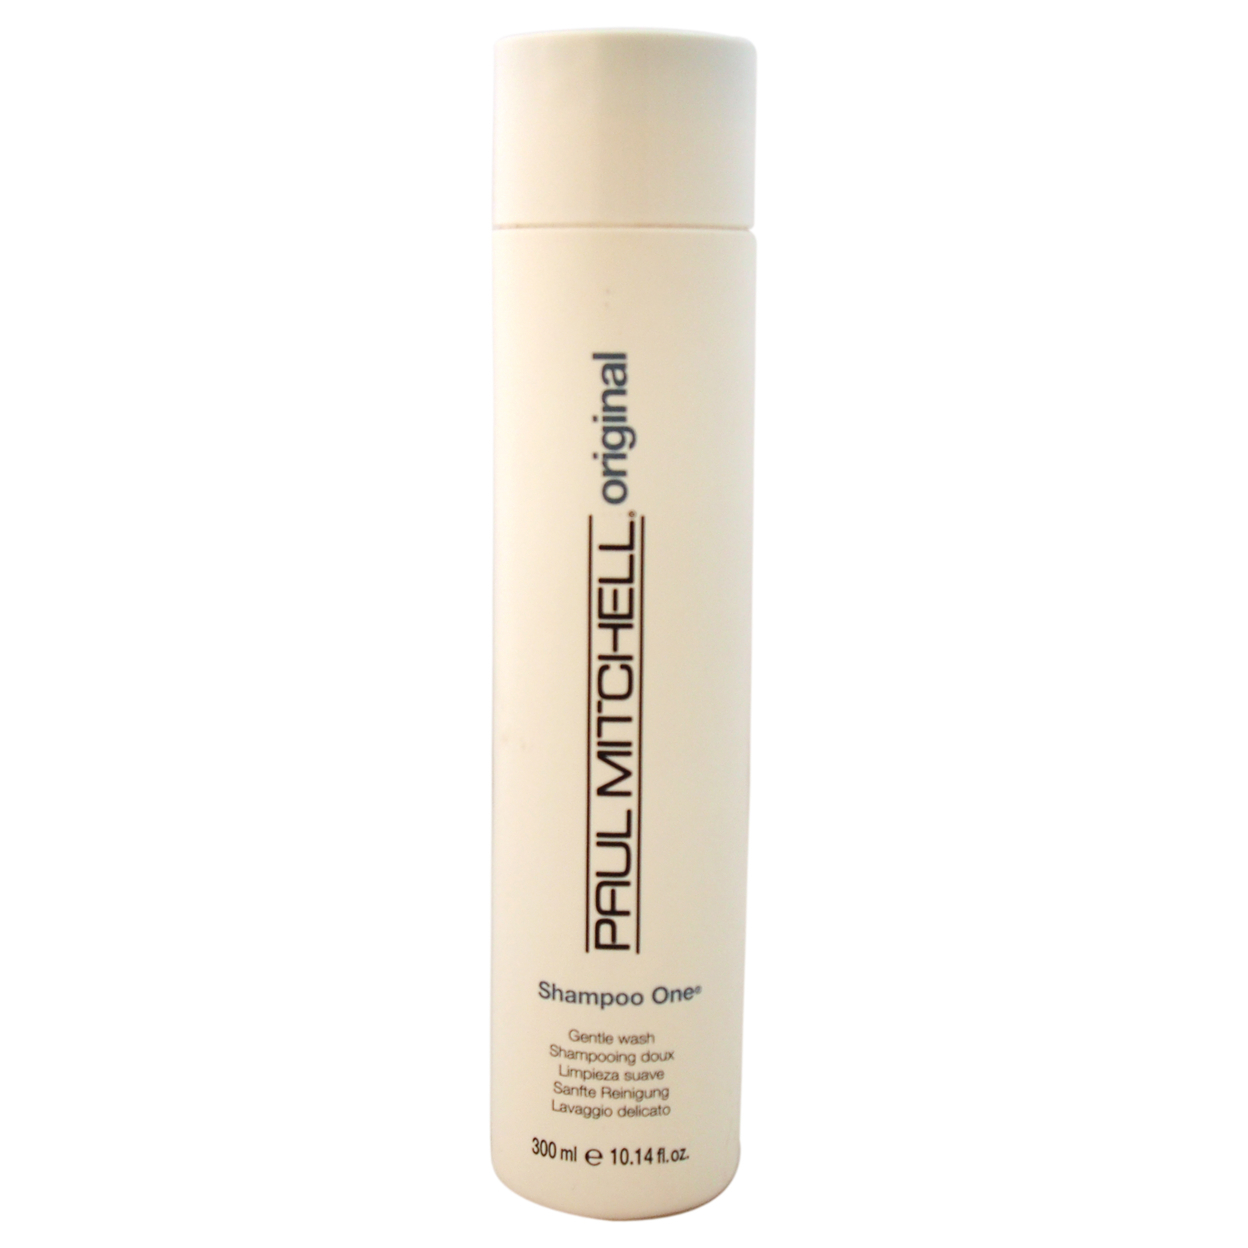 Shampoo One By Paul Mitchell For Unisex 10.14 Oz Shampoo